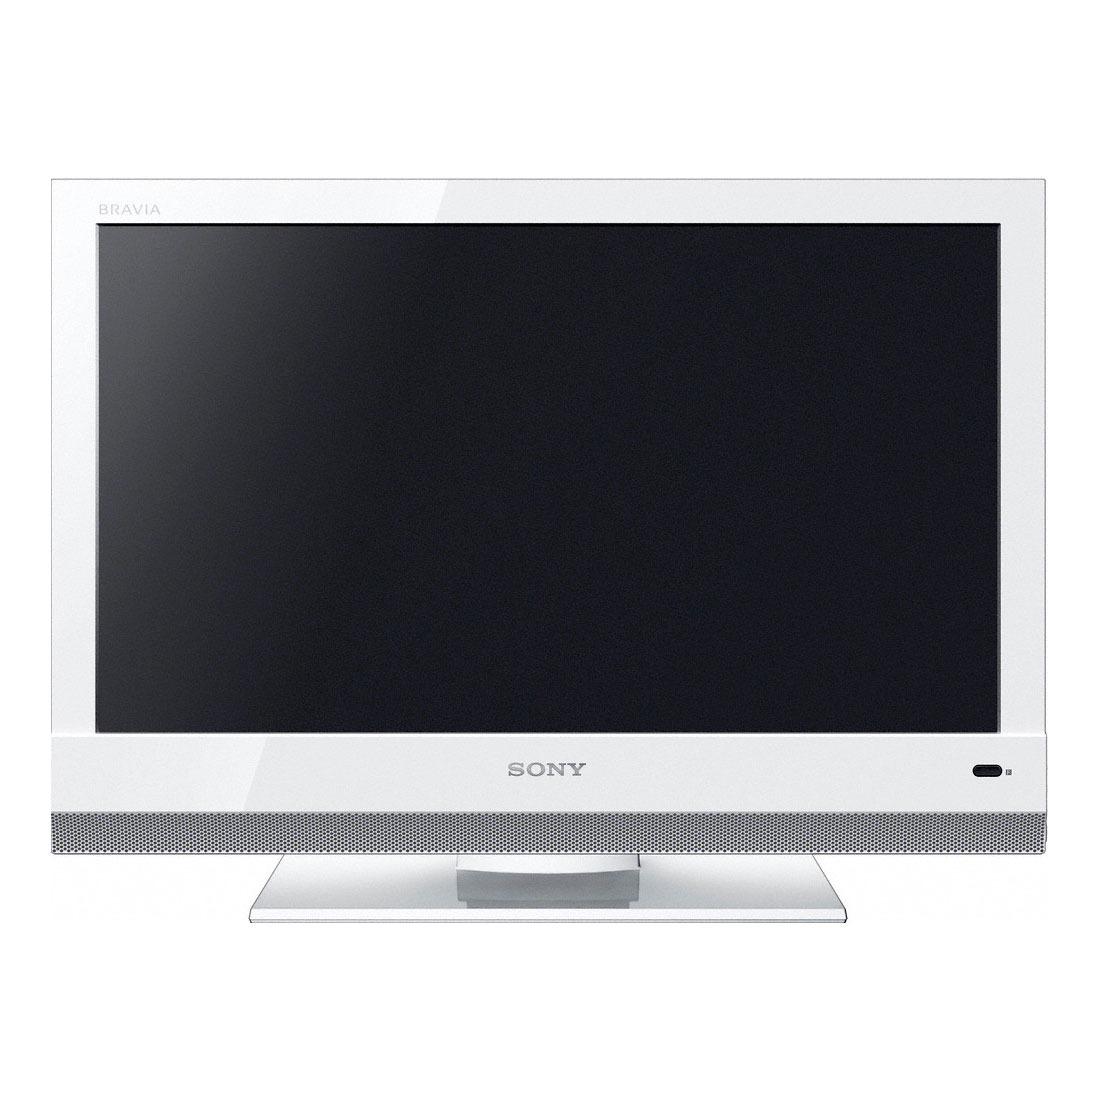 sony bravia kdl 19bx200w tv sony sur ldlc. Black Bedroom Furniture Sets. Home Design Ideas